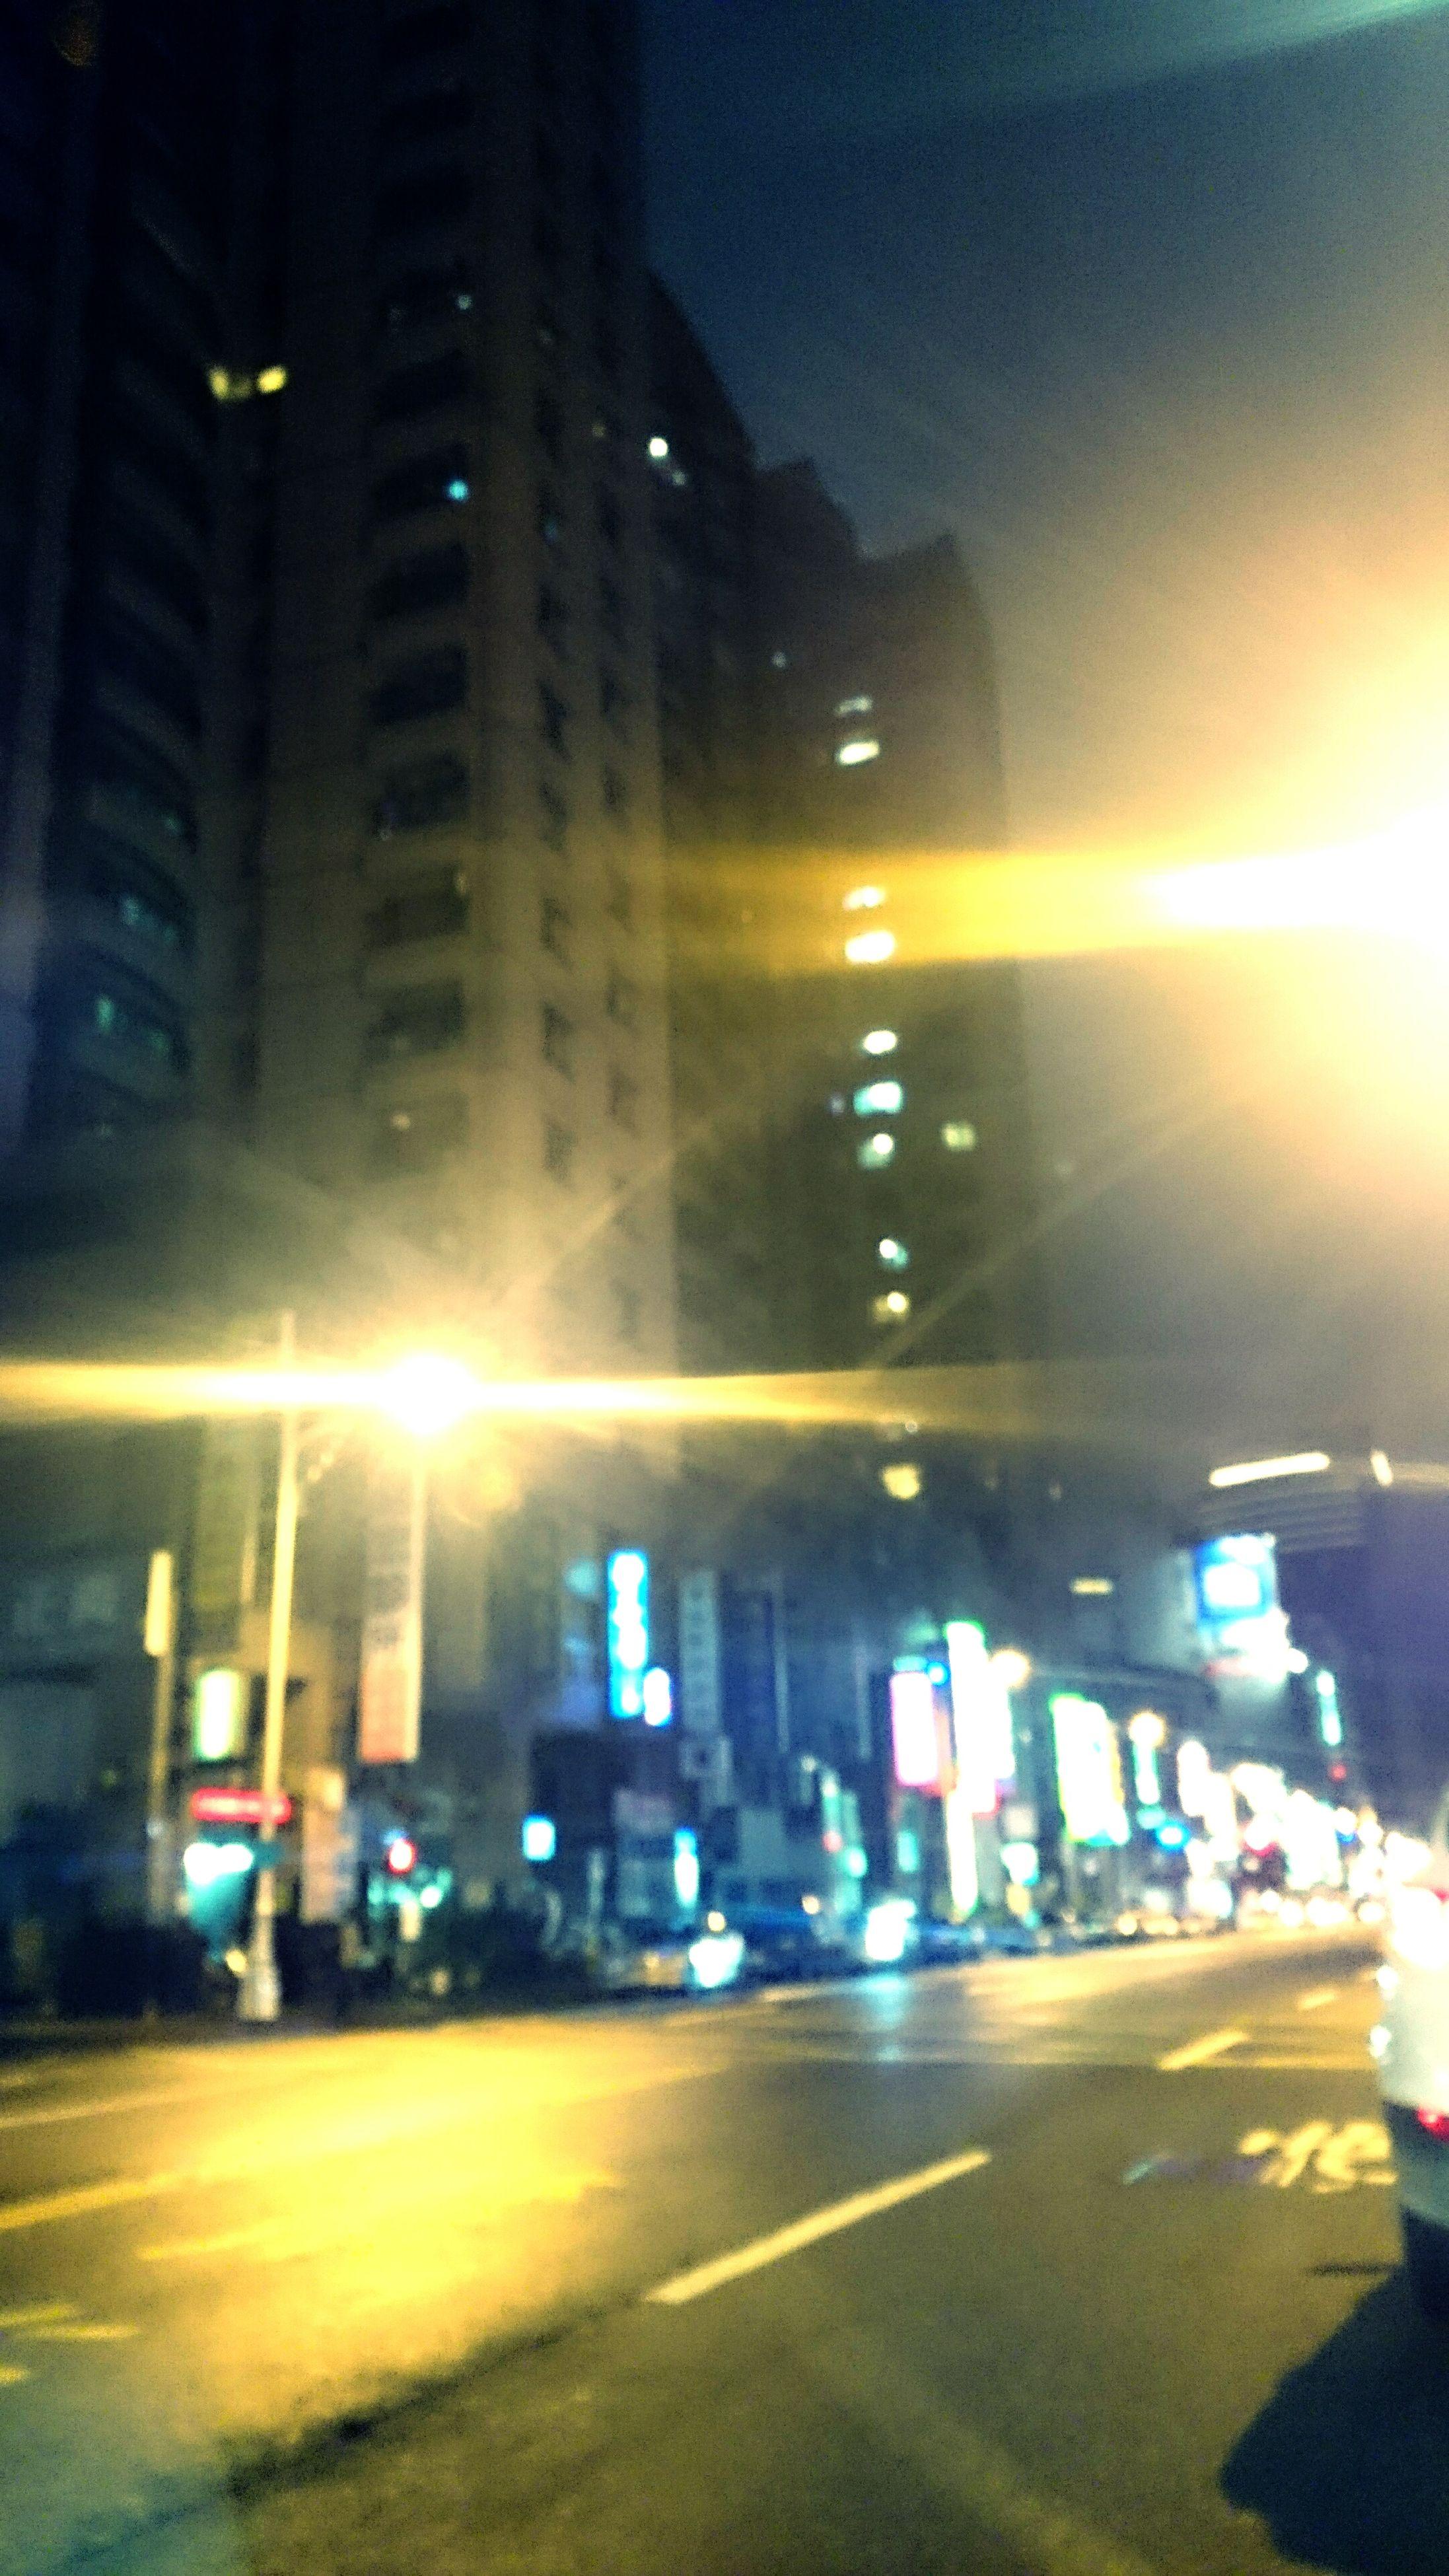 transportation, car, city, illuminated, land vehicle, mode of transport, building exterior, street, road, architecture, night, built structure, city street, traffic, street light, city life, road marking, on the move, sky, headlight